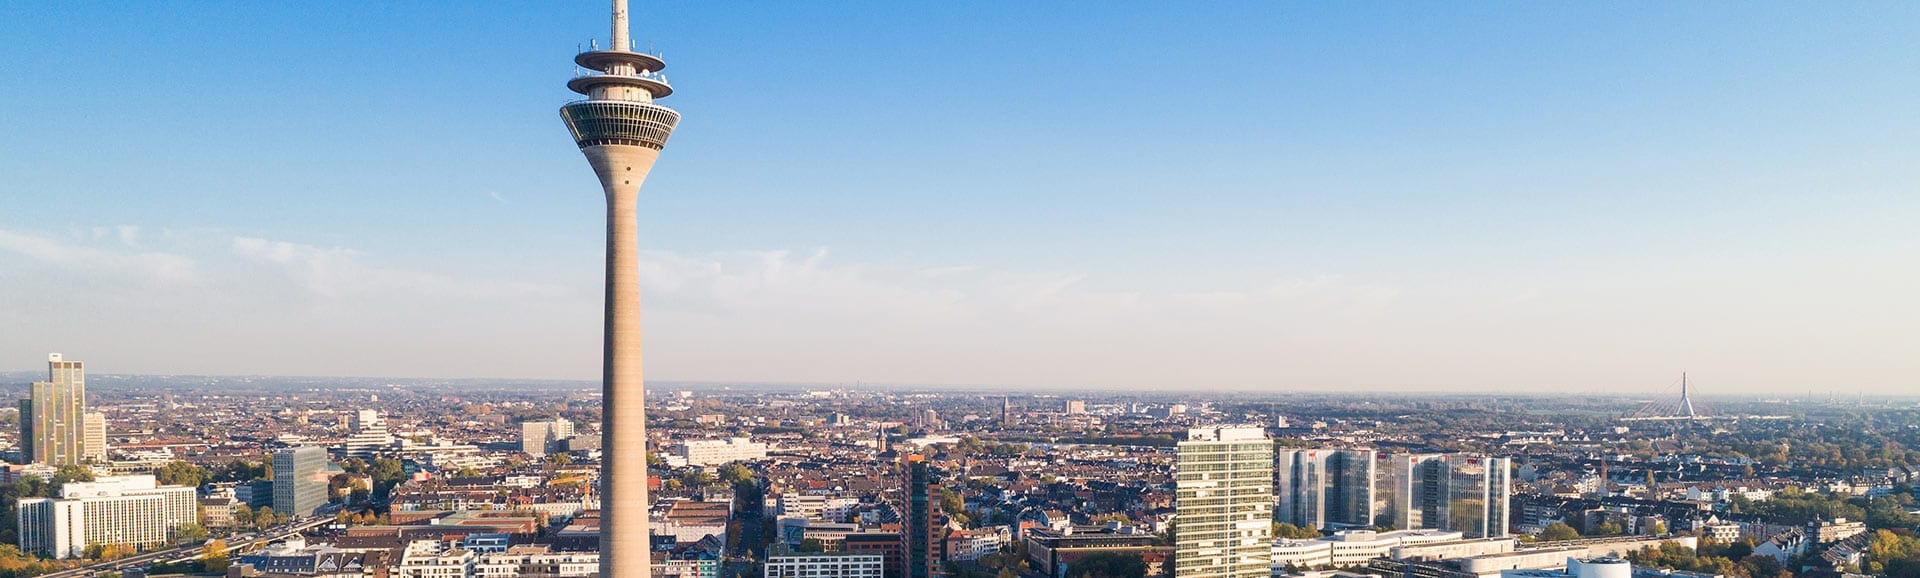 Blick über Düsseldorf